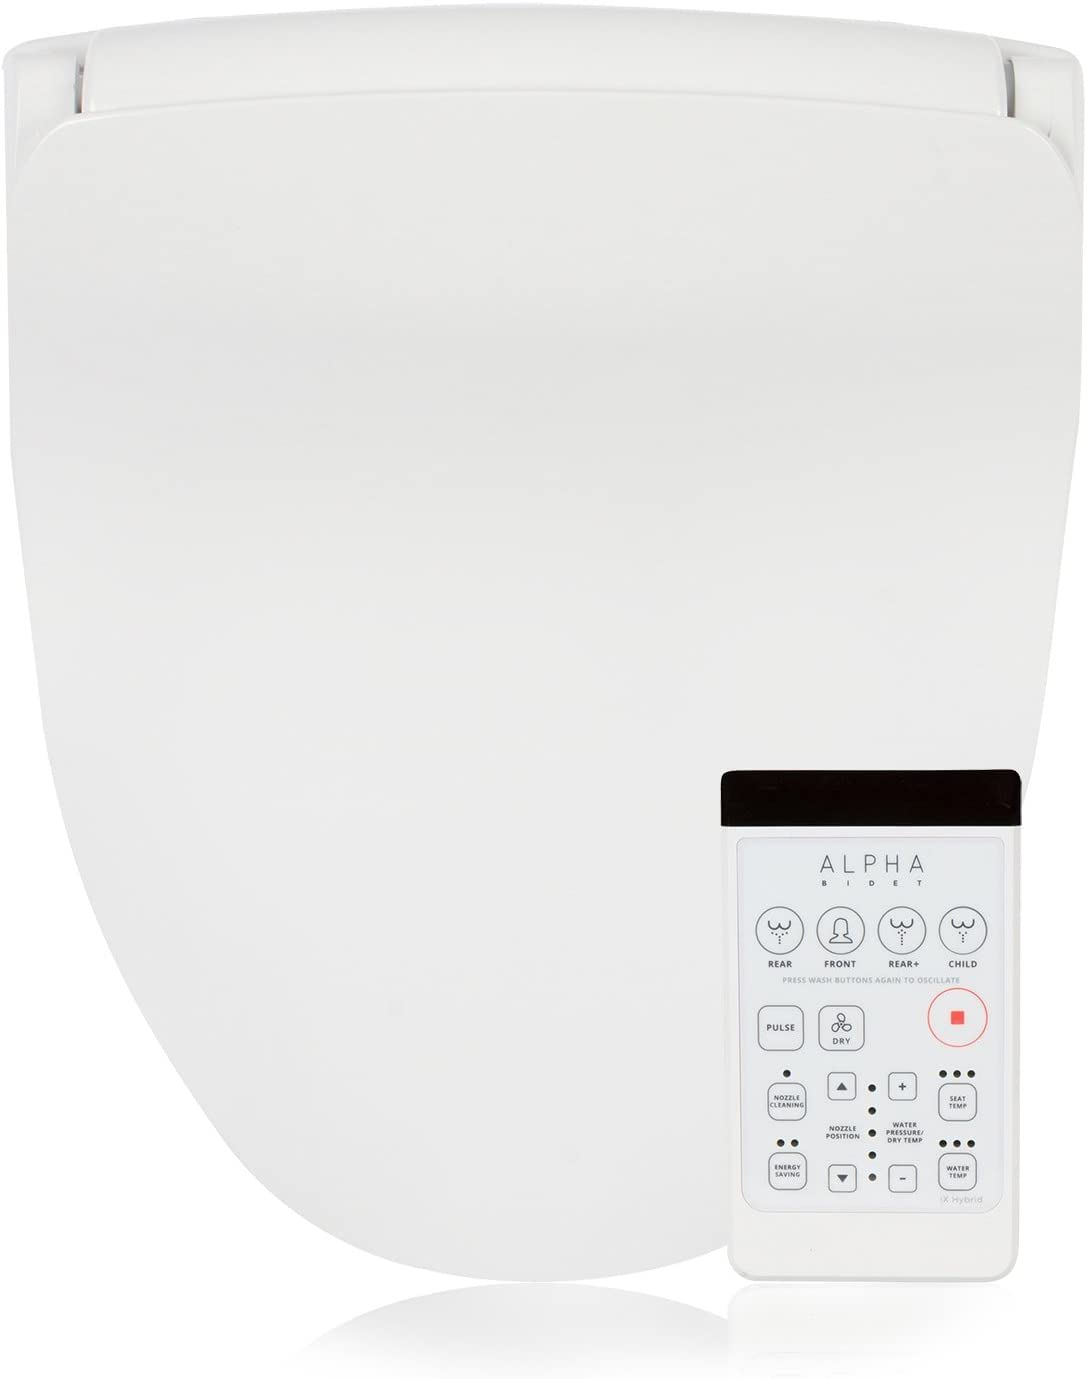 Alpha iX Hybrid Bidet Toilet Seat in Elongated White